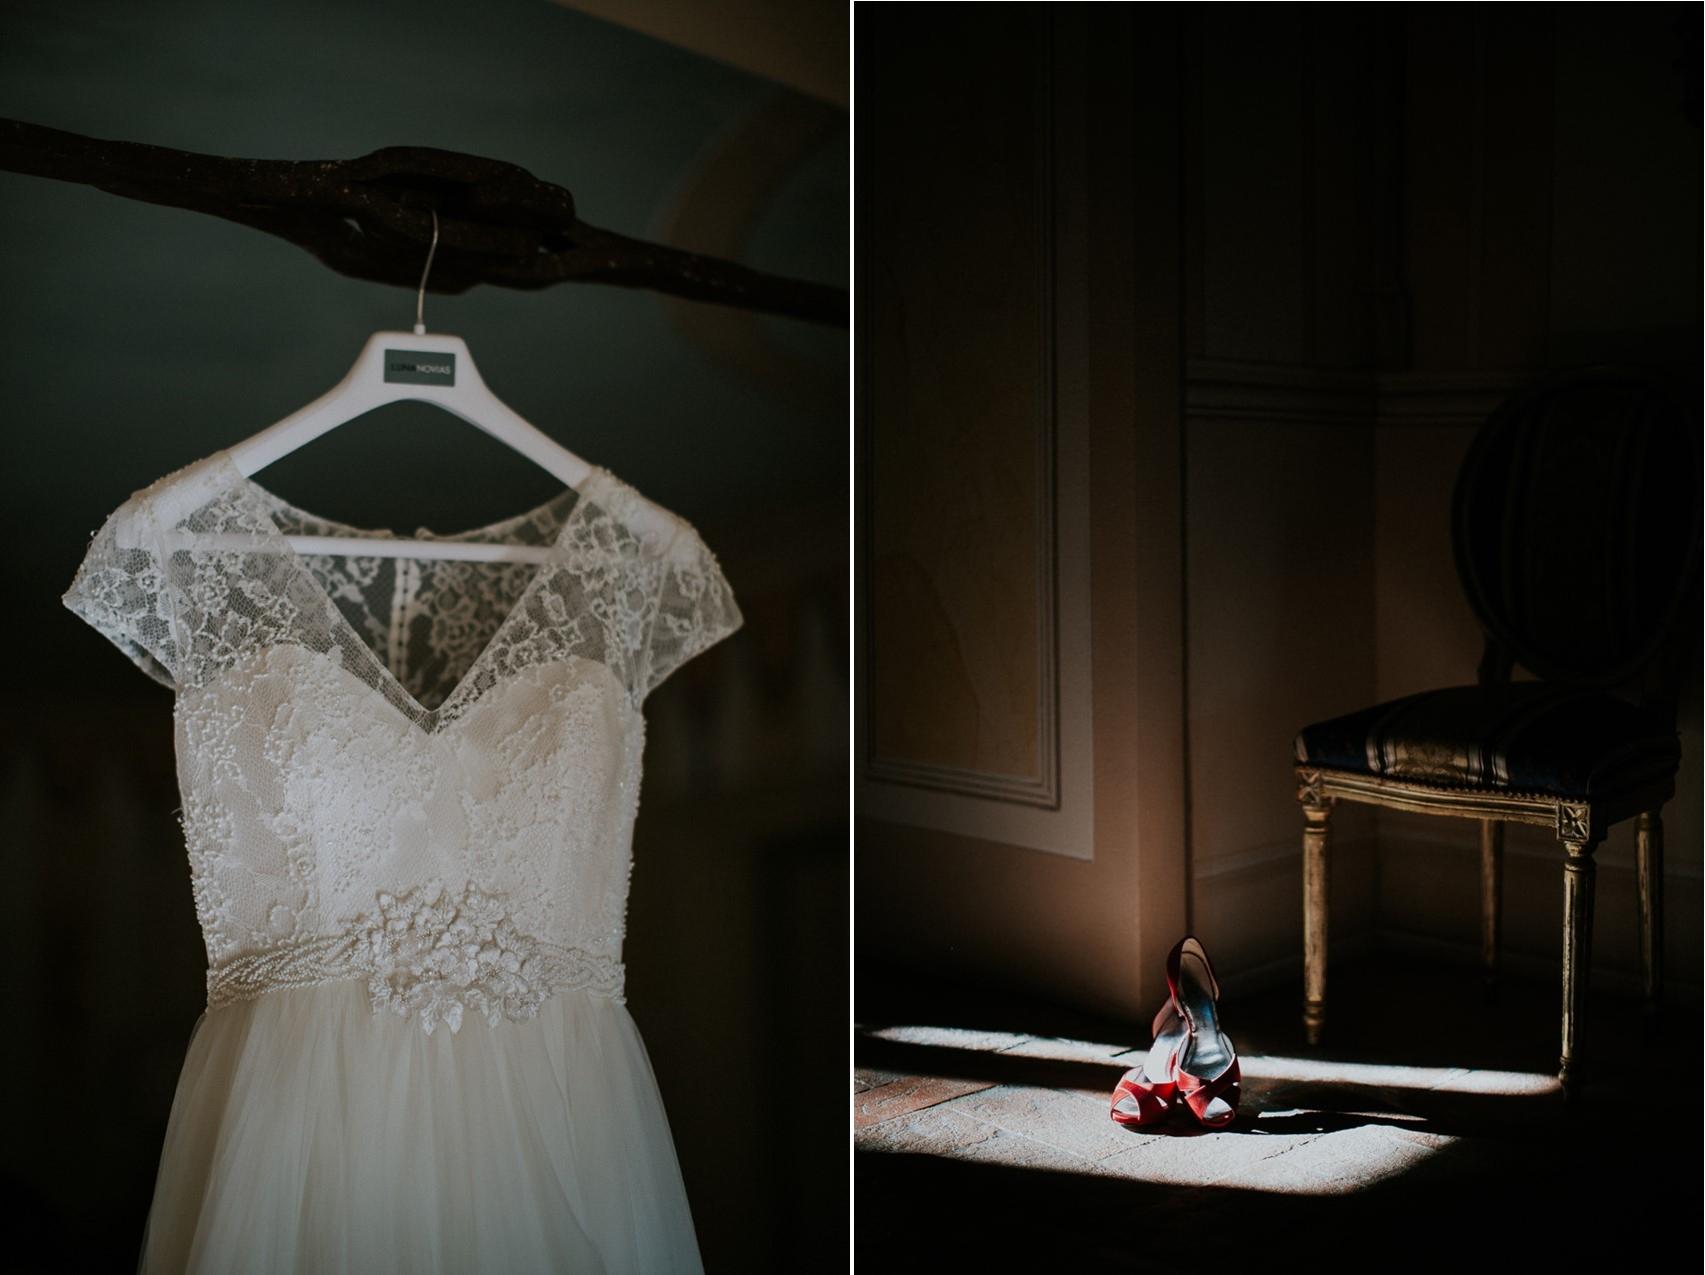 Wedding Dress & Red Bridal Shoes